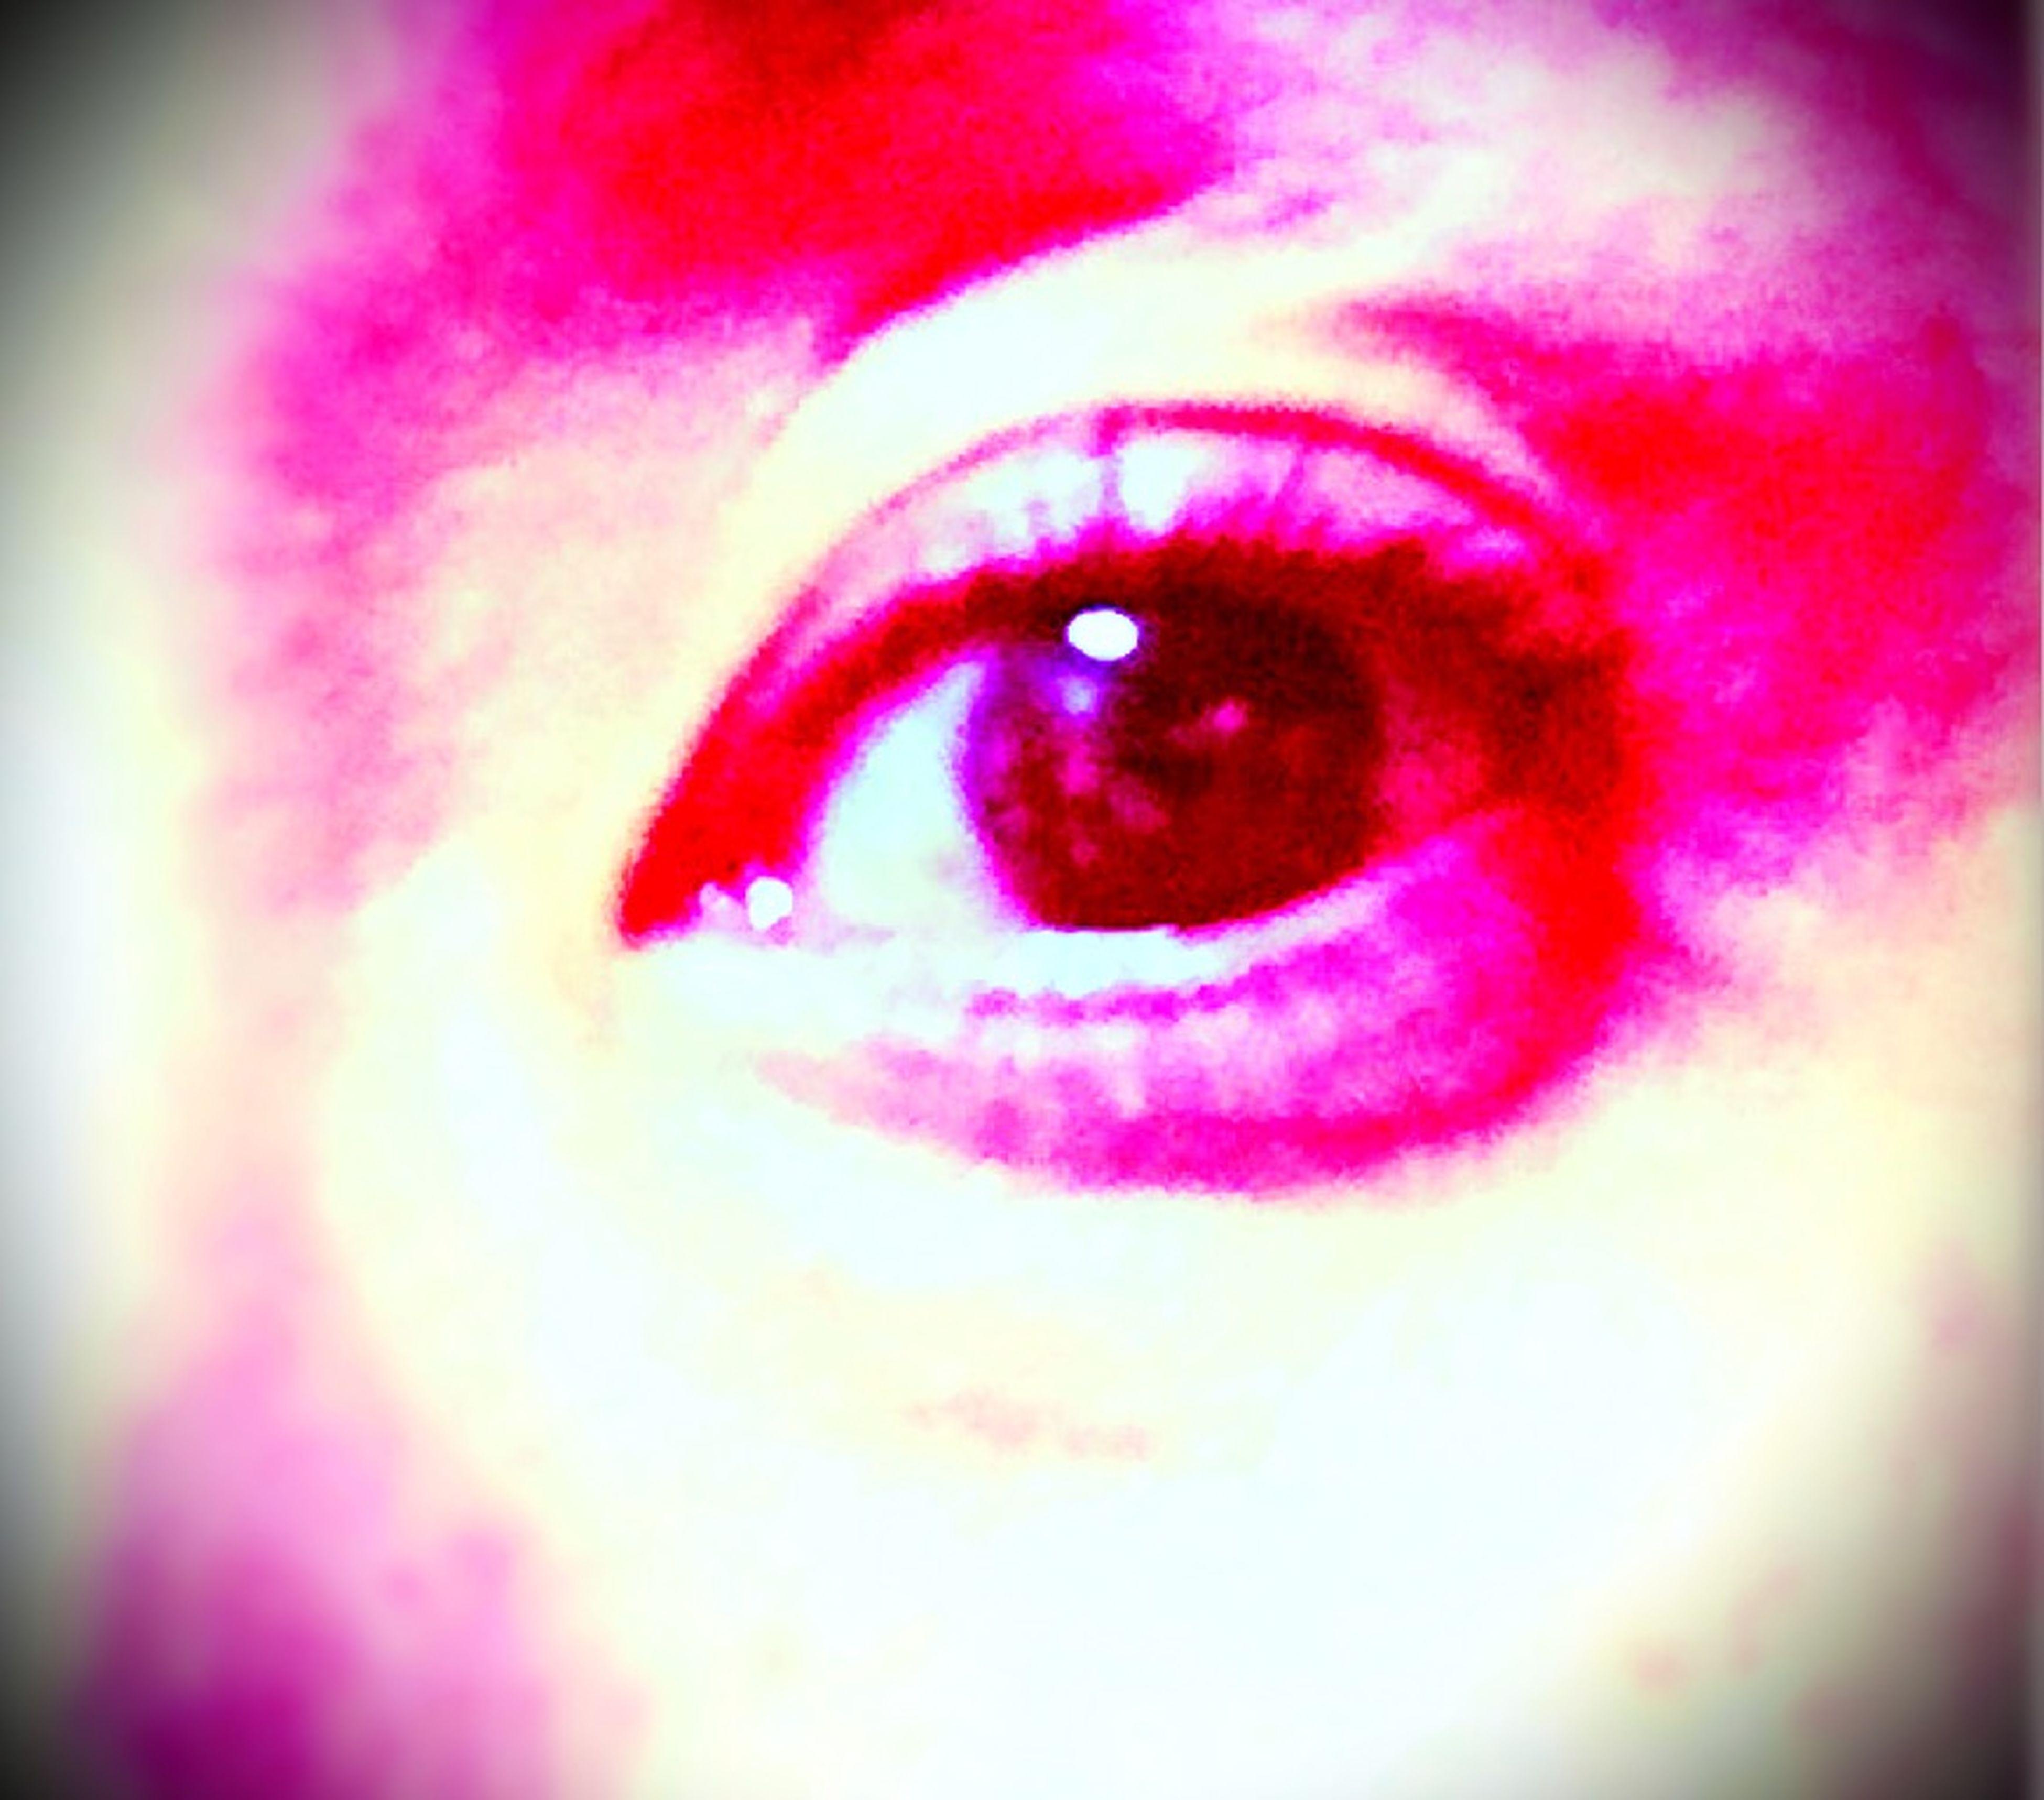 red, close-up, human eye, pink color, extreme close-up, eyelash, human face, part of, reflection, selective focus, circle, sensory perception, extreme close up, indoors, headshot, eyesight, detail